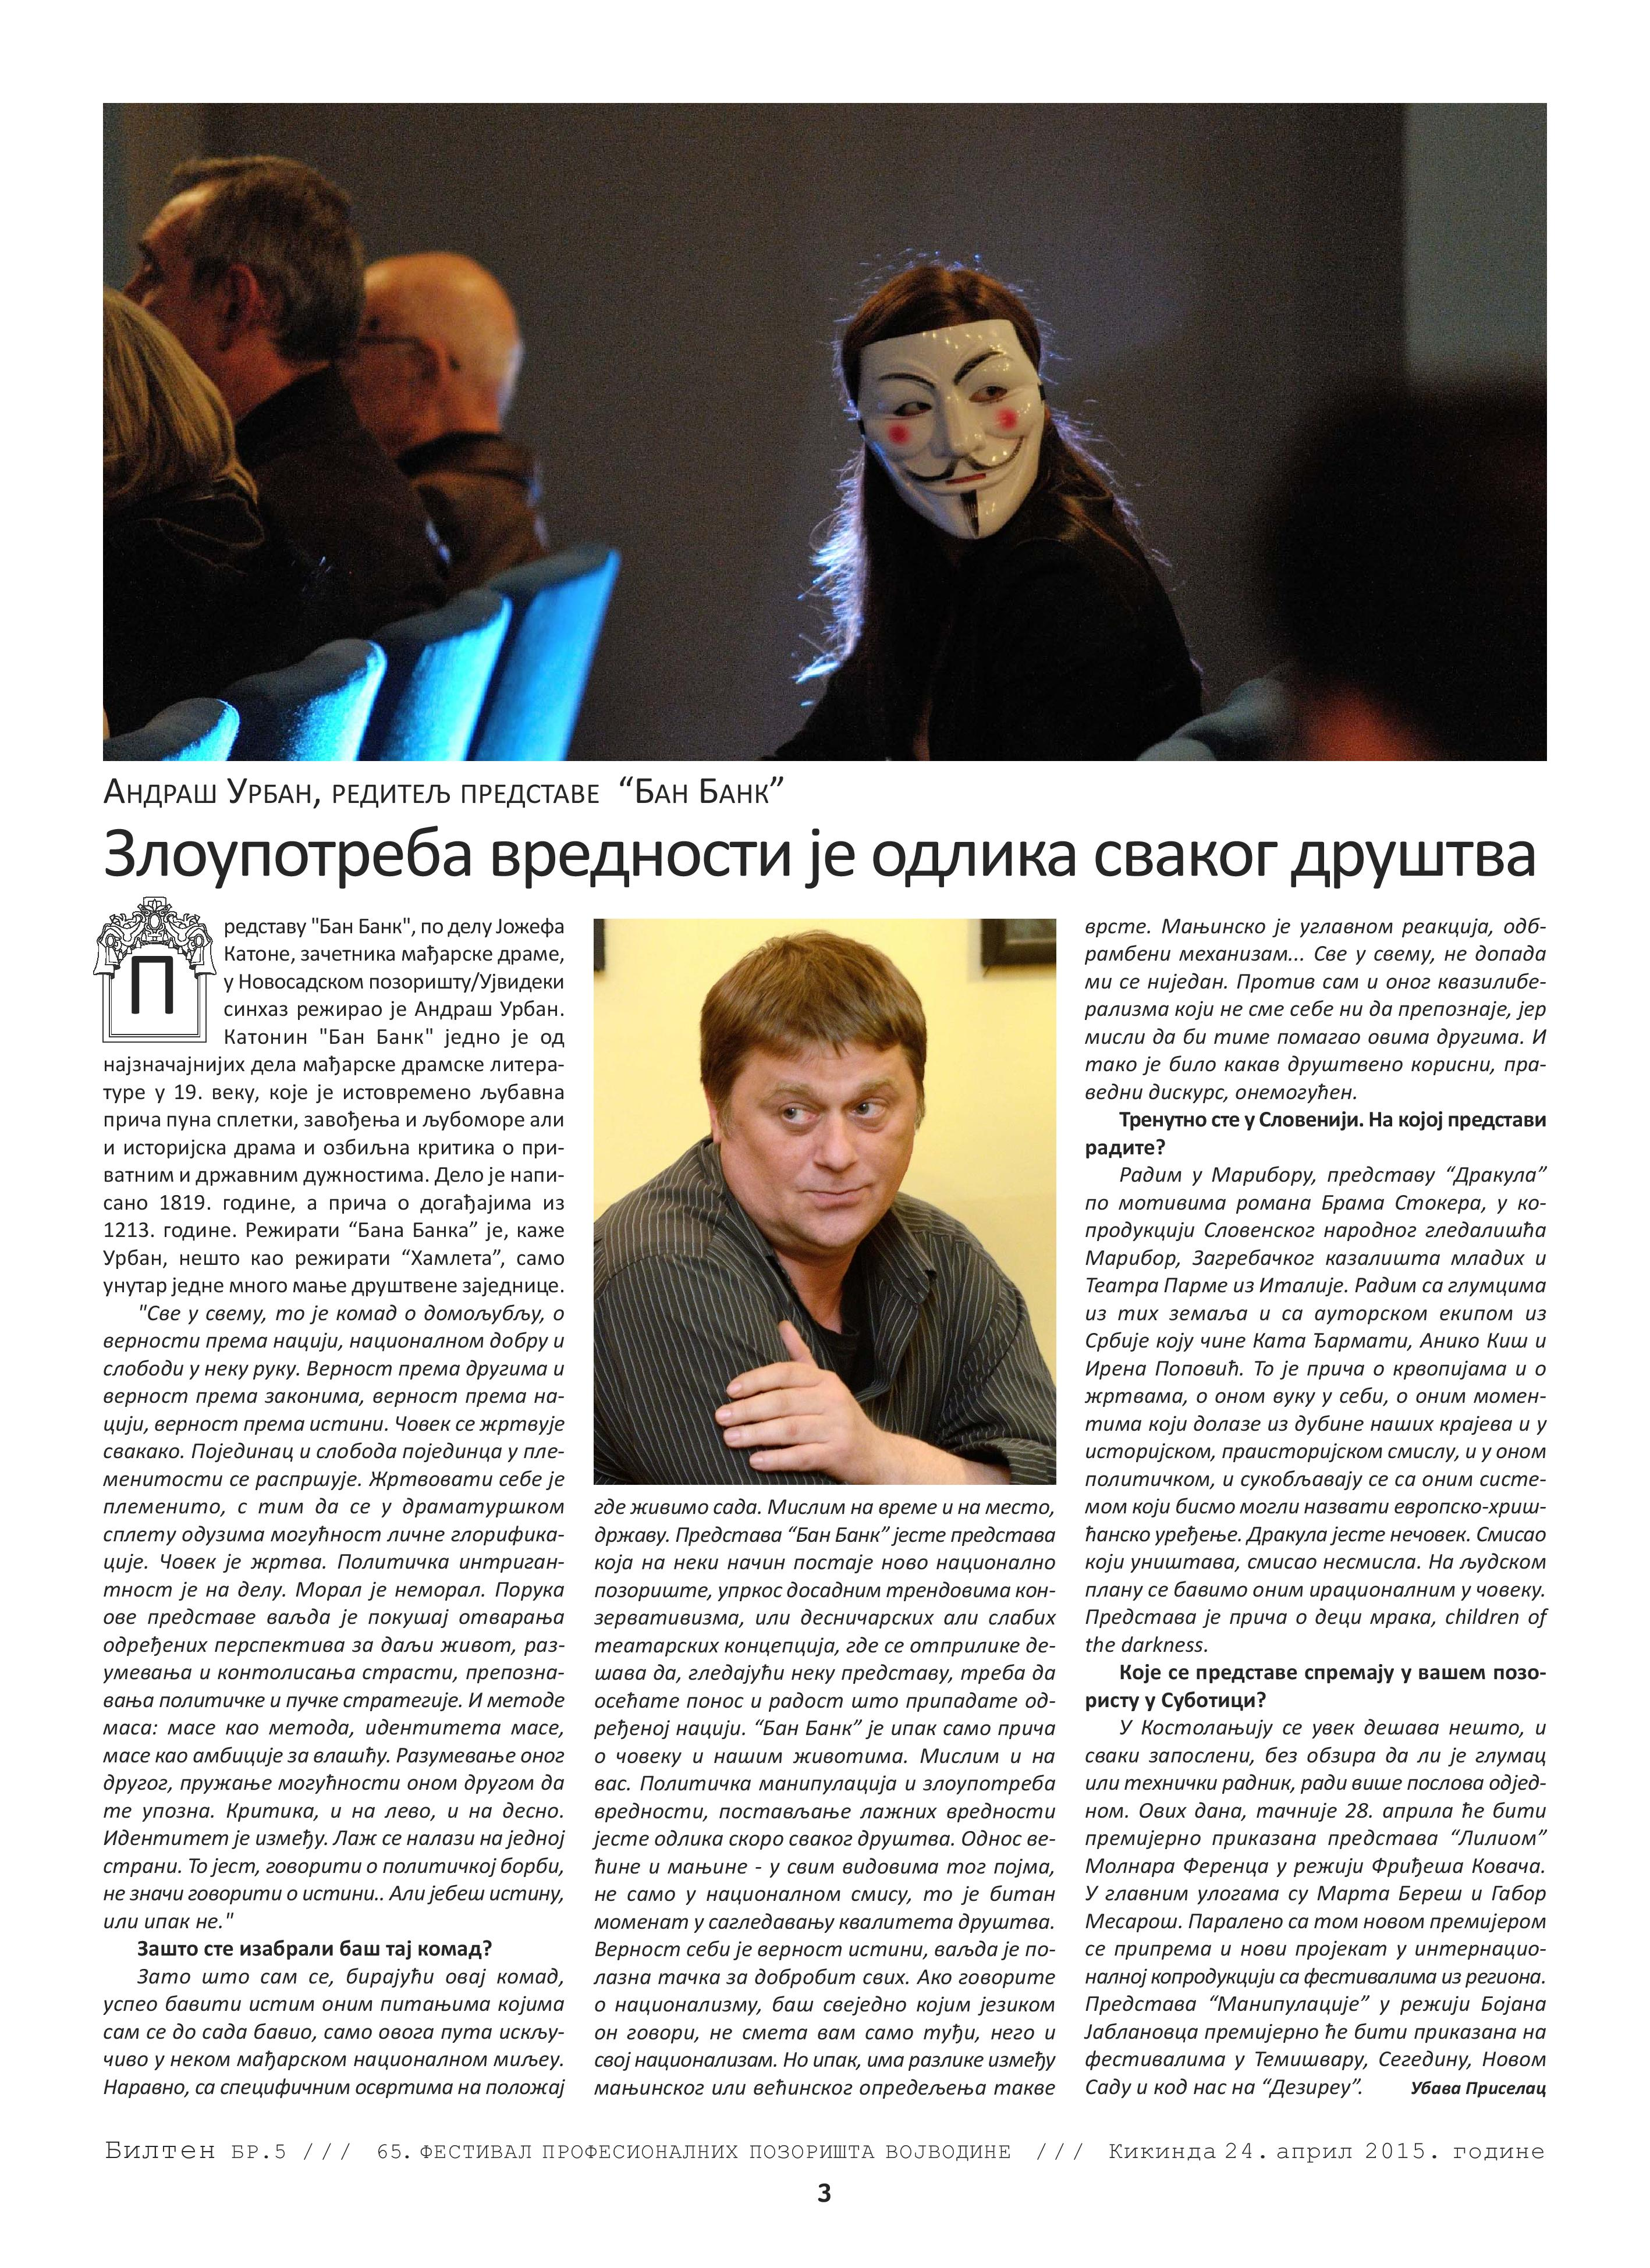 BILTEN_05_24 april-page-003